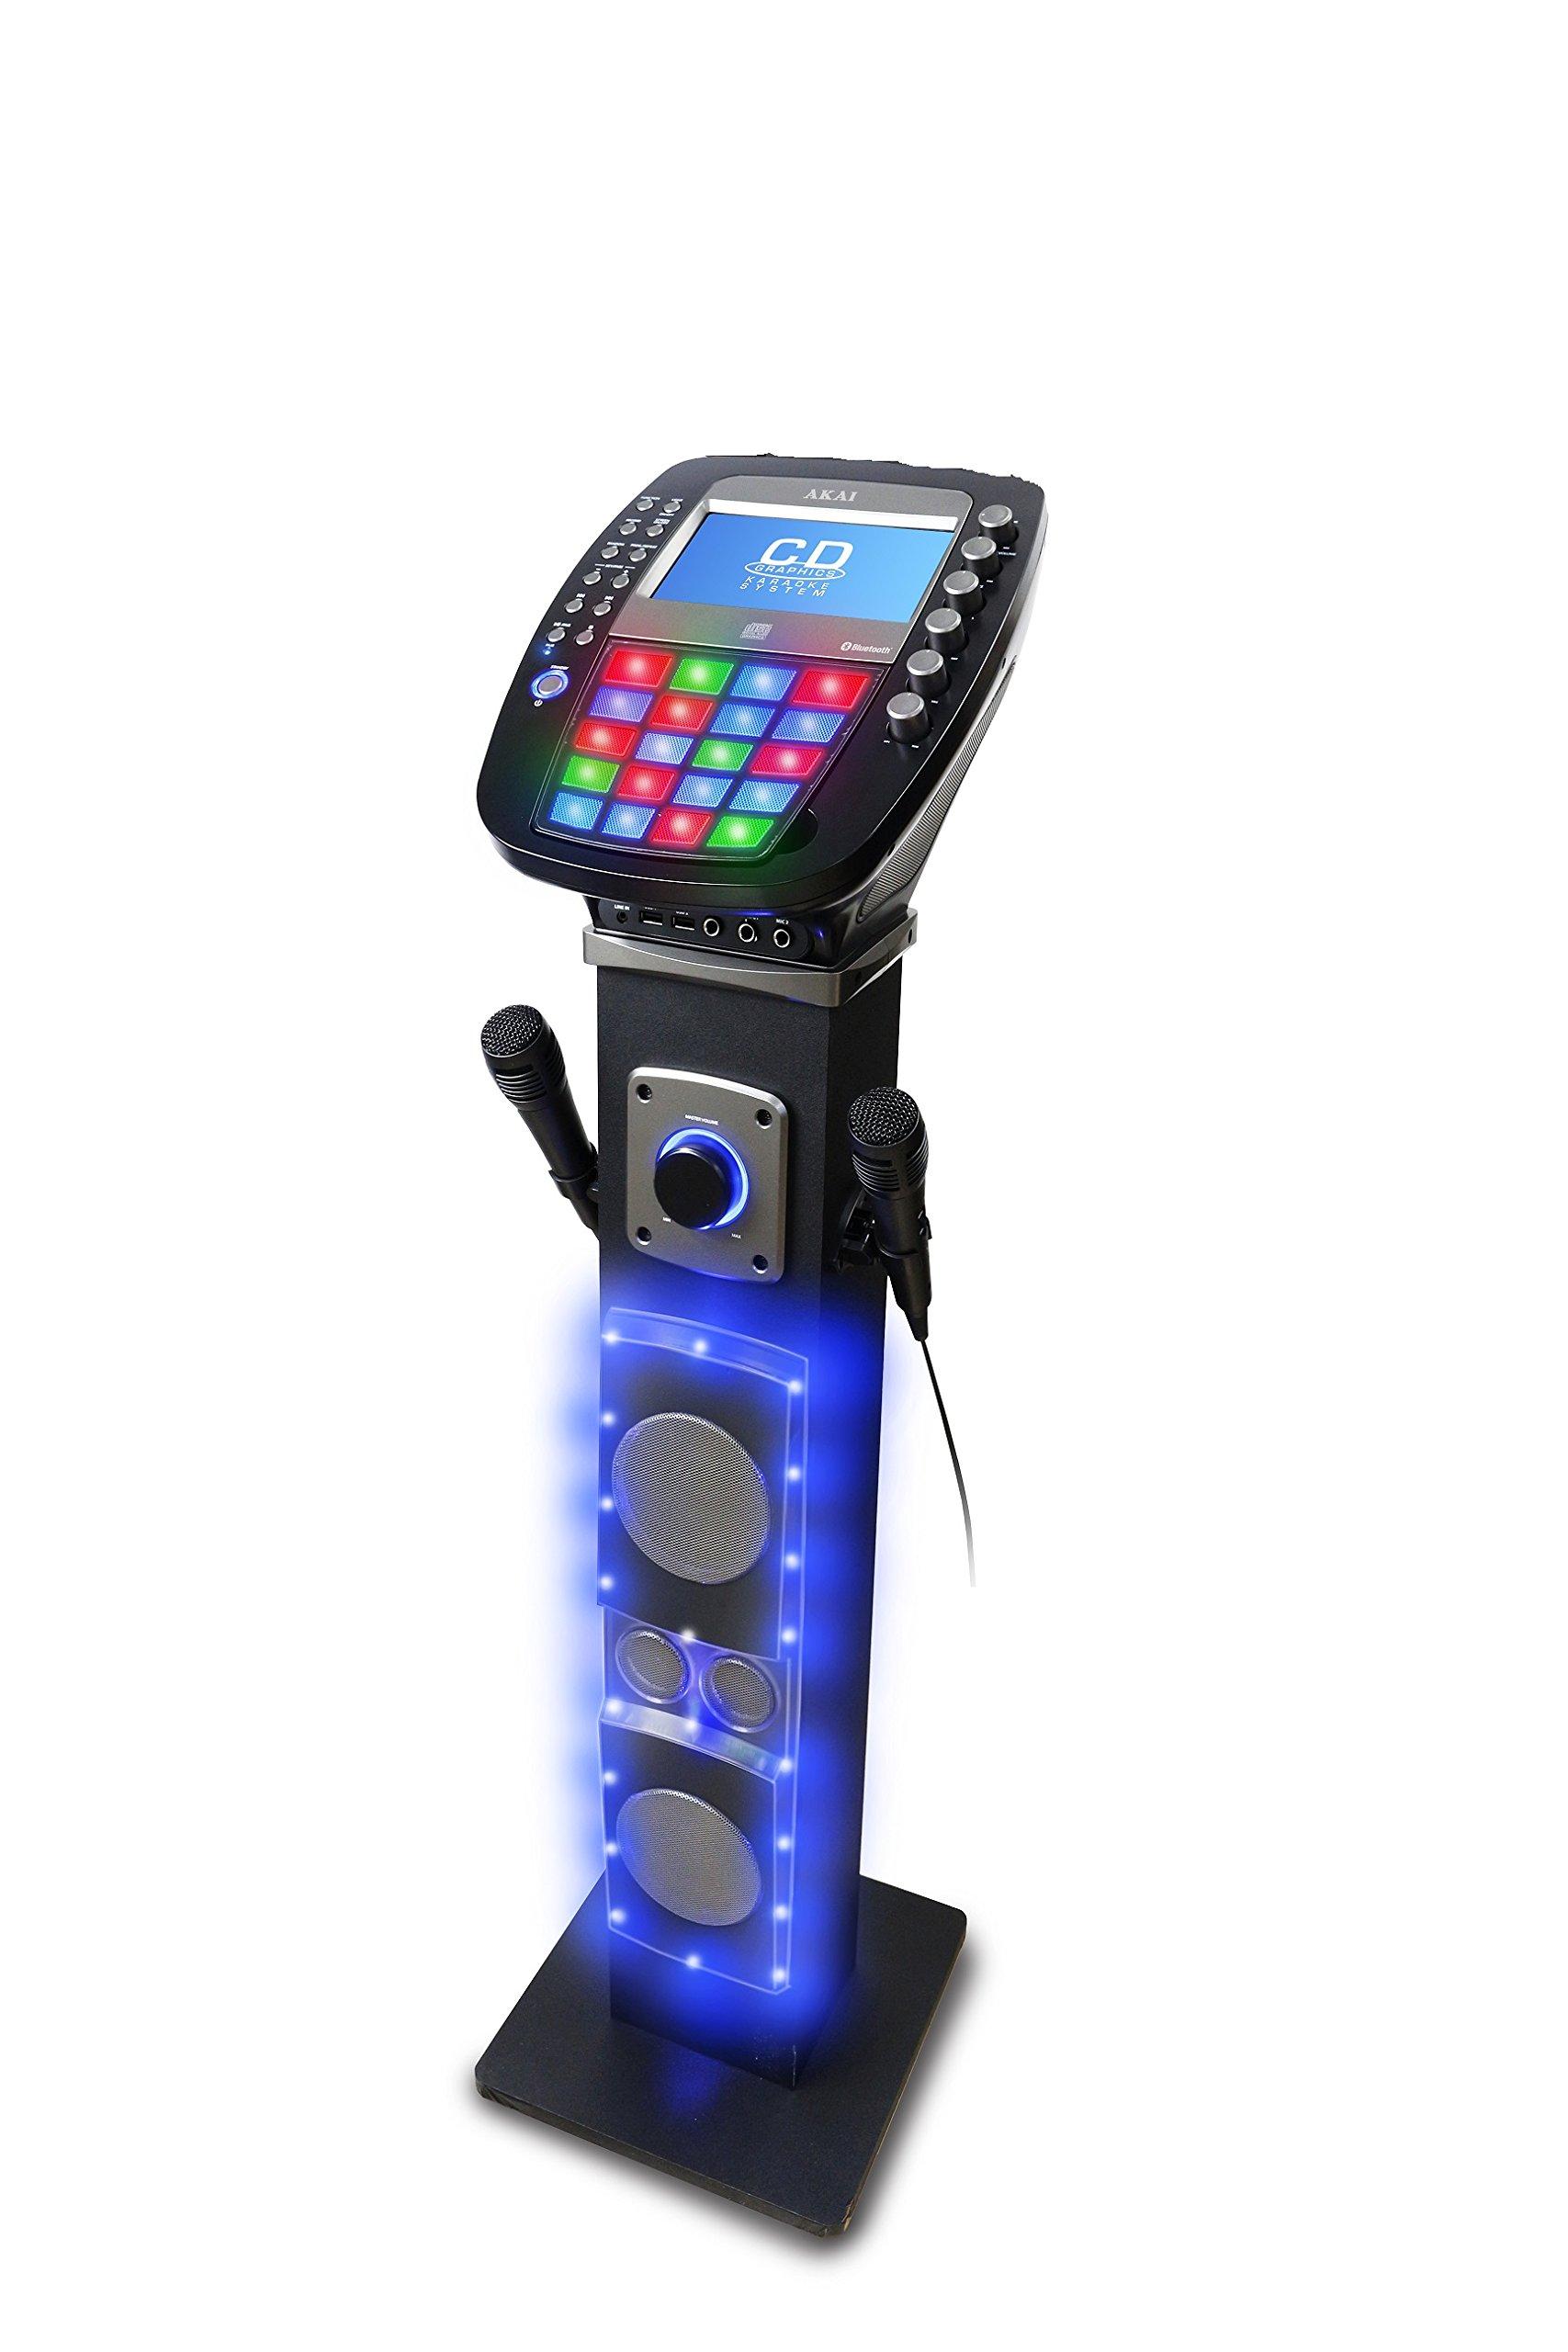 Akai KS878-BT Bluetooth Pedestal CD&G Karaoke System, Black by Akai